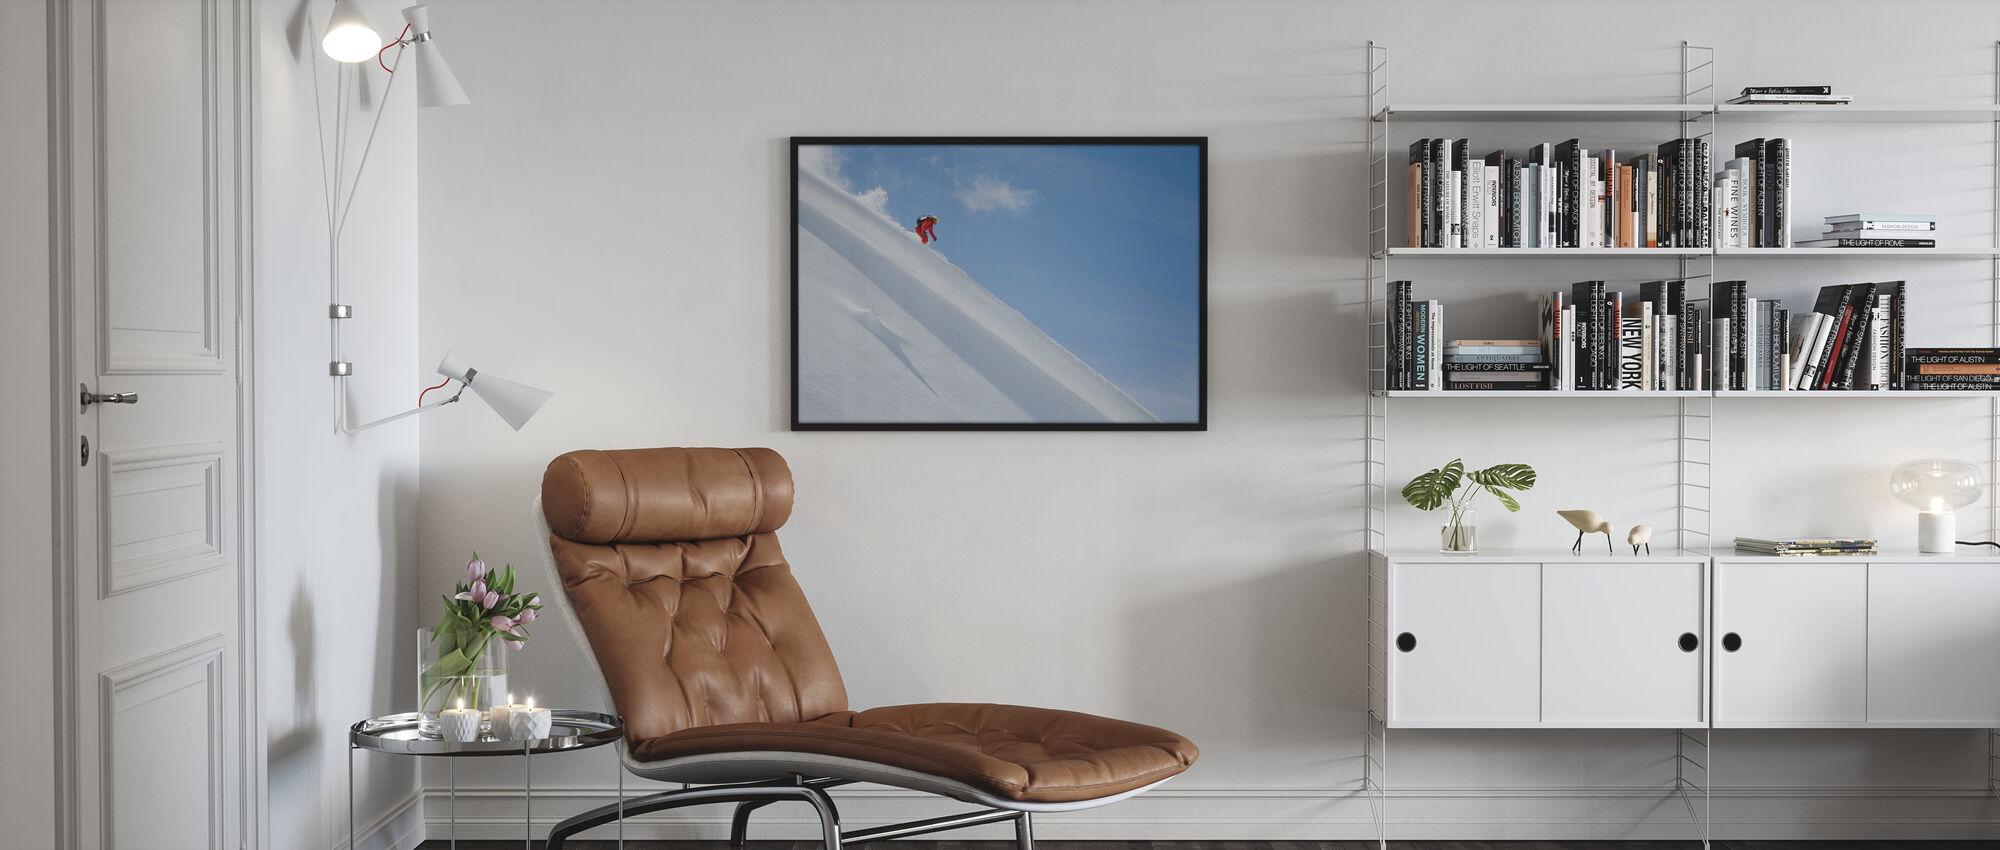 Off Piste Skiing - Poster - Living Room